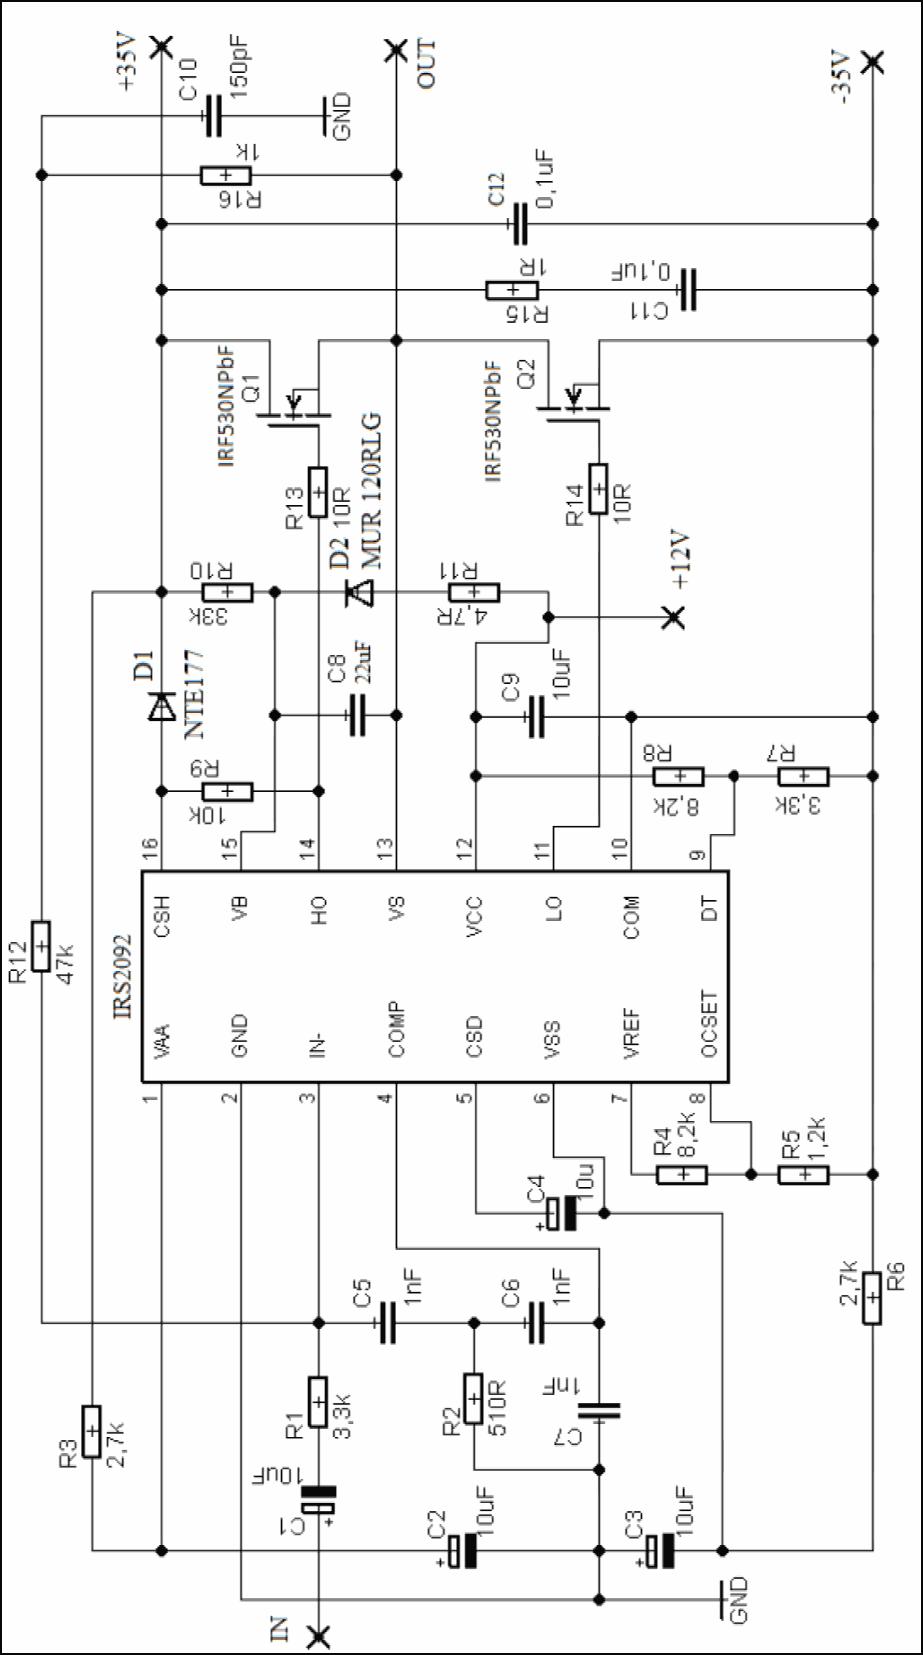 Automatic Car Alarm Circuit Diagram Nonstopfree Electronic Circuits